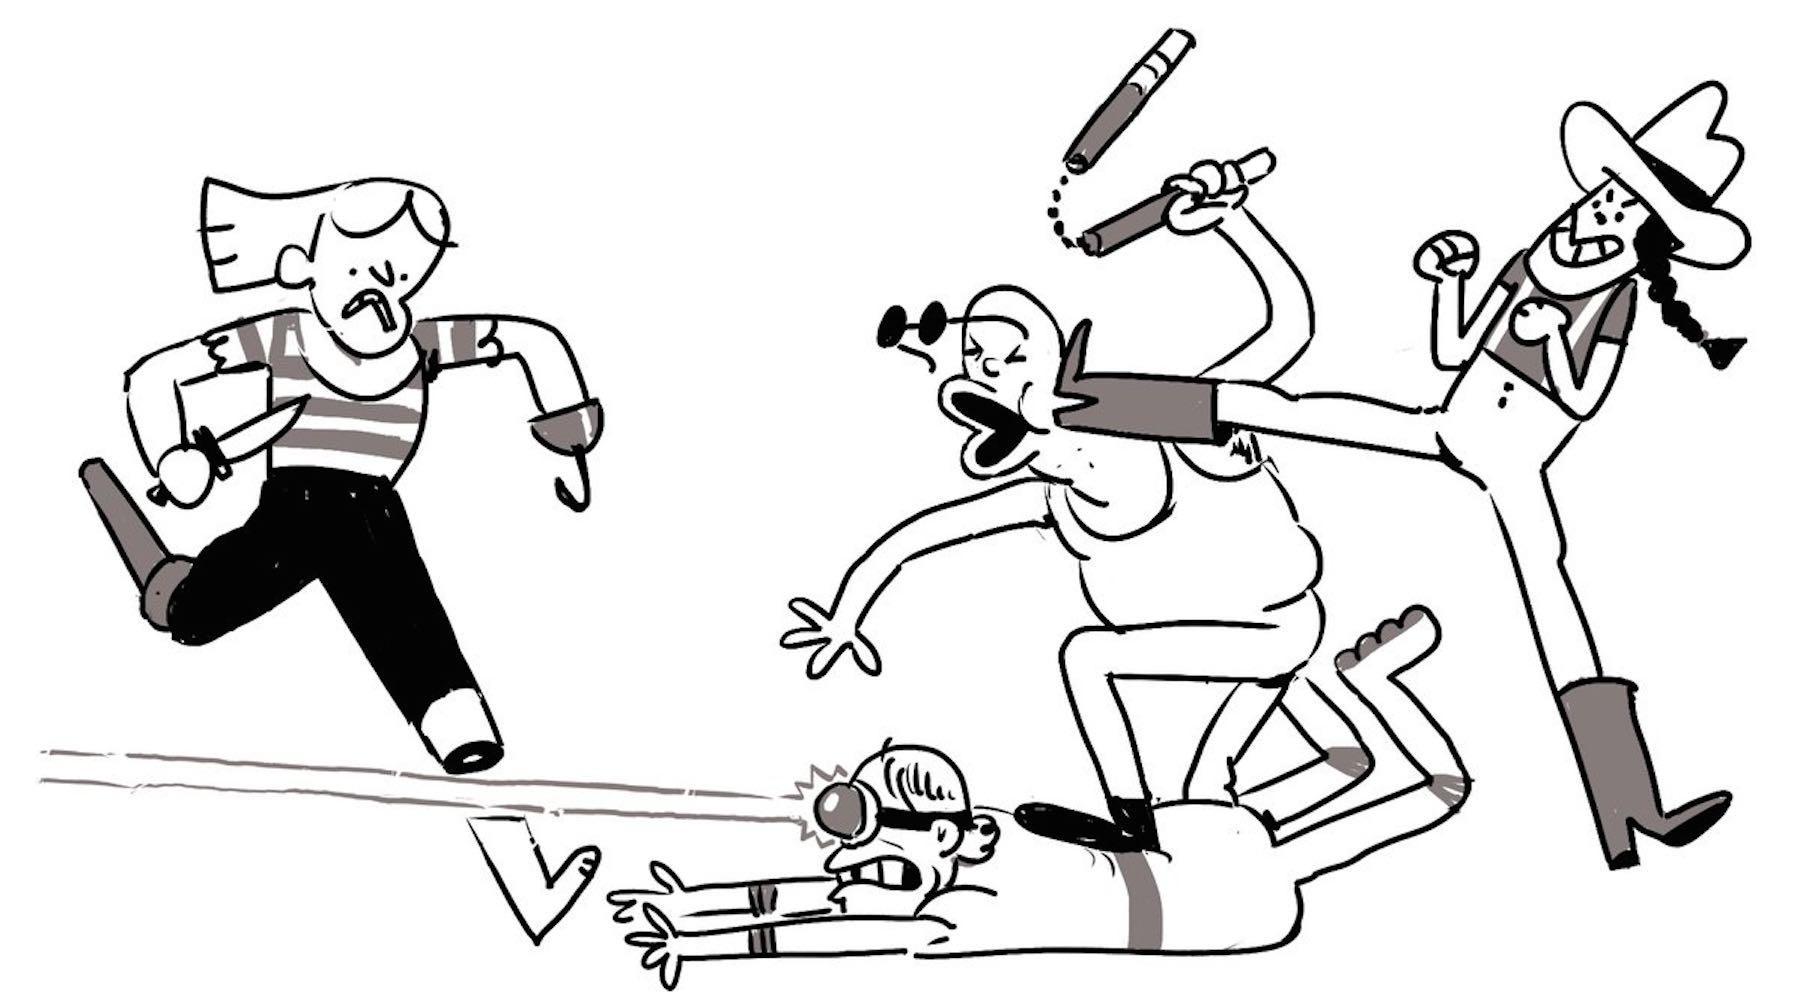 cartoon-1521205975241.jpg